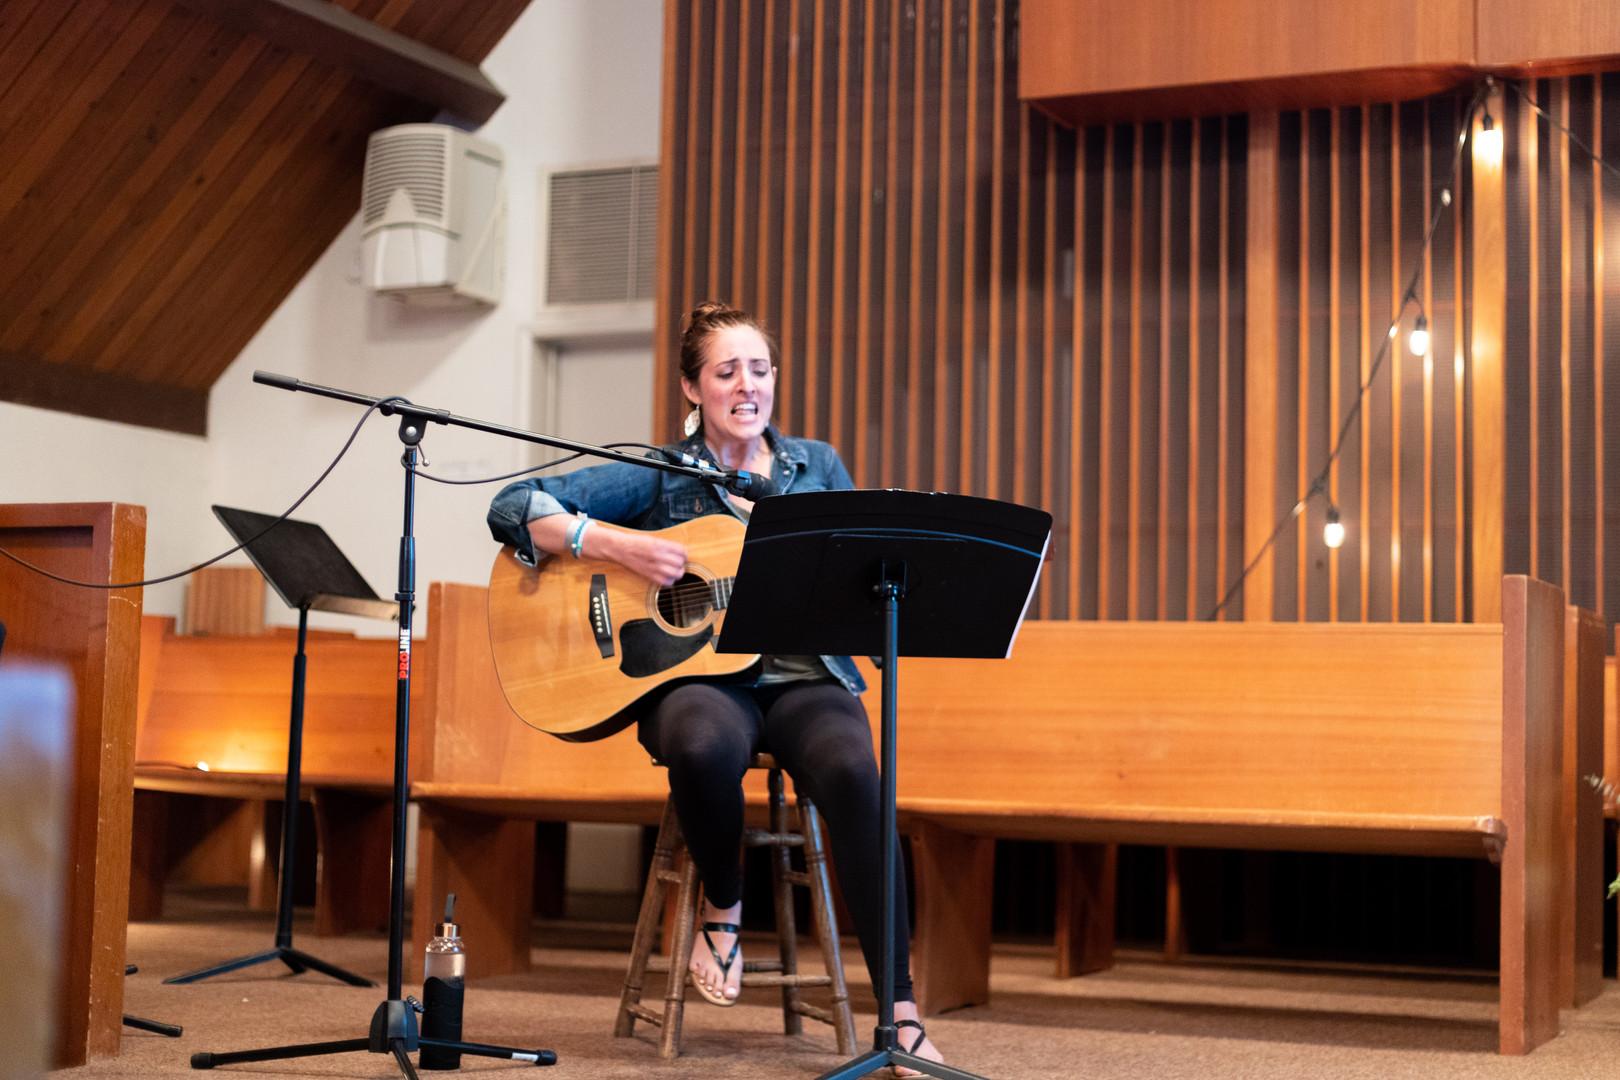 Sabrina Gauer leads worship